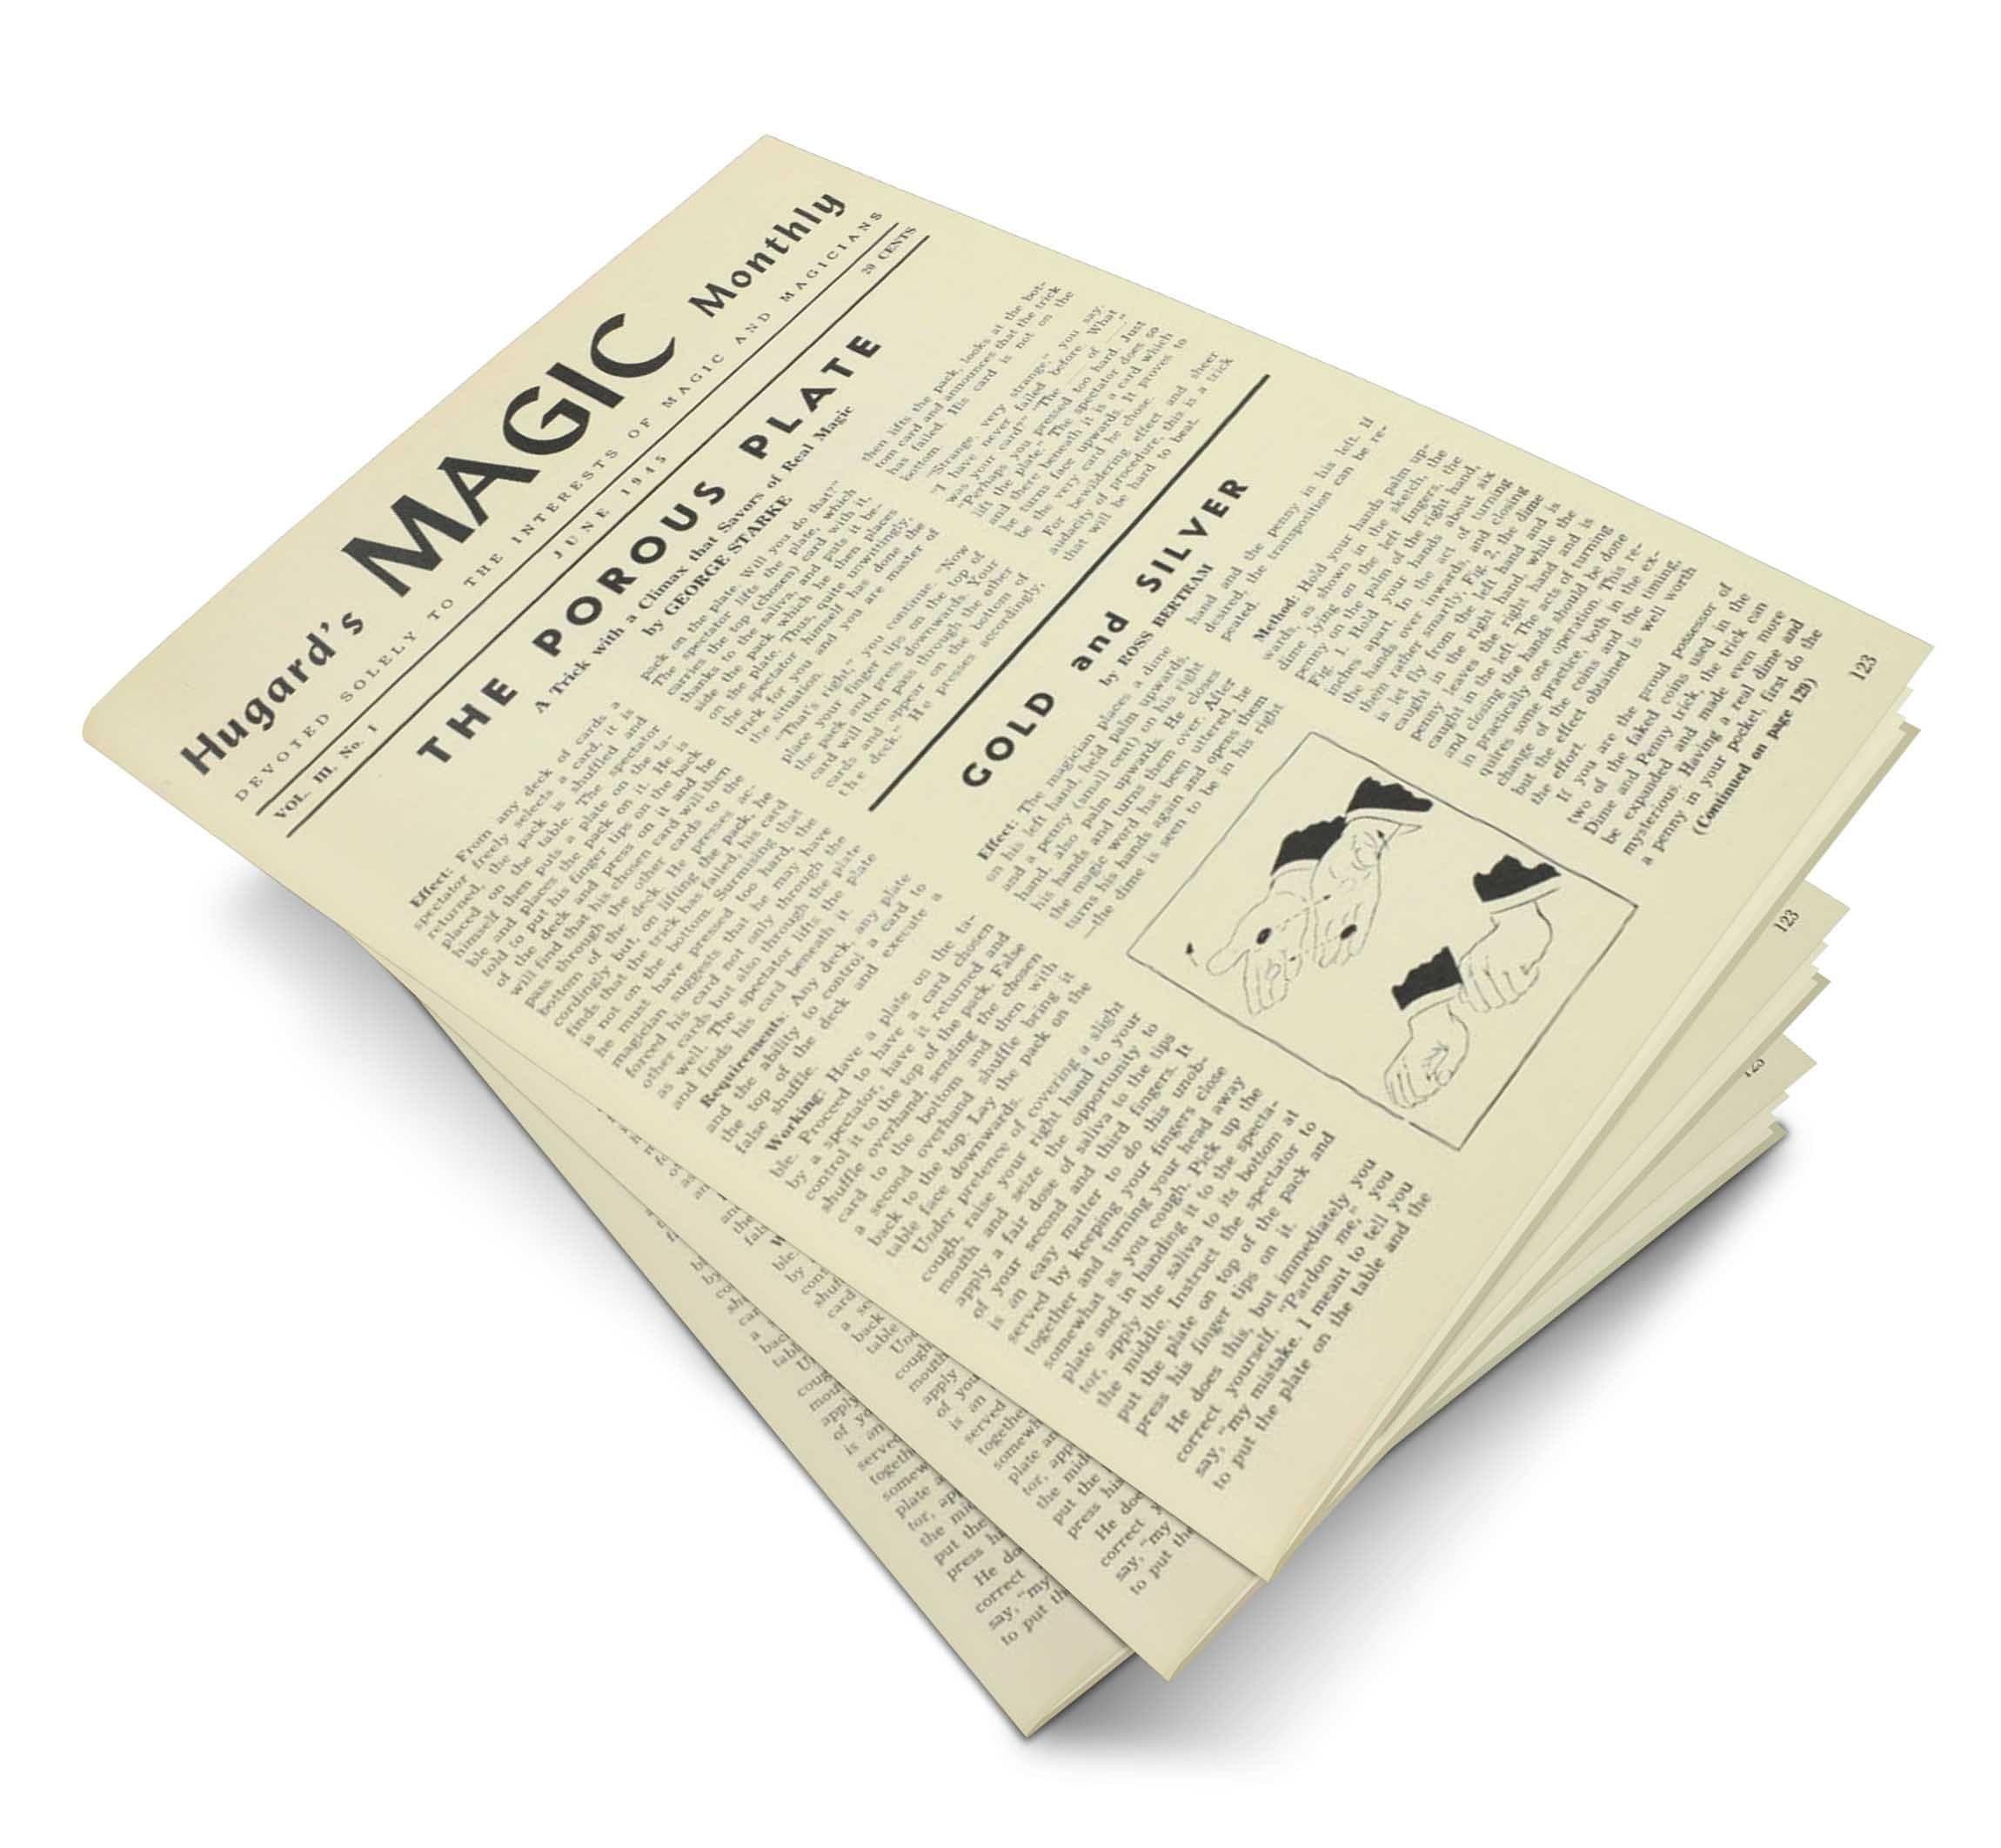 Hugard's Magic Monthly Volume 3 - magic